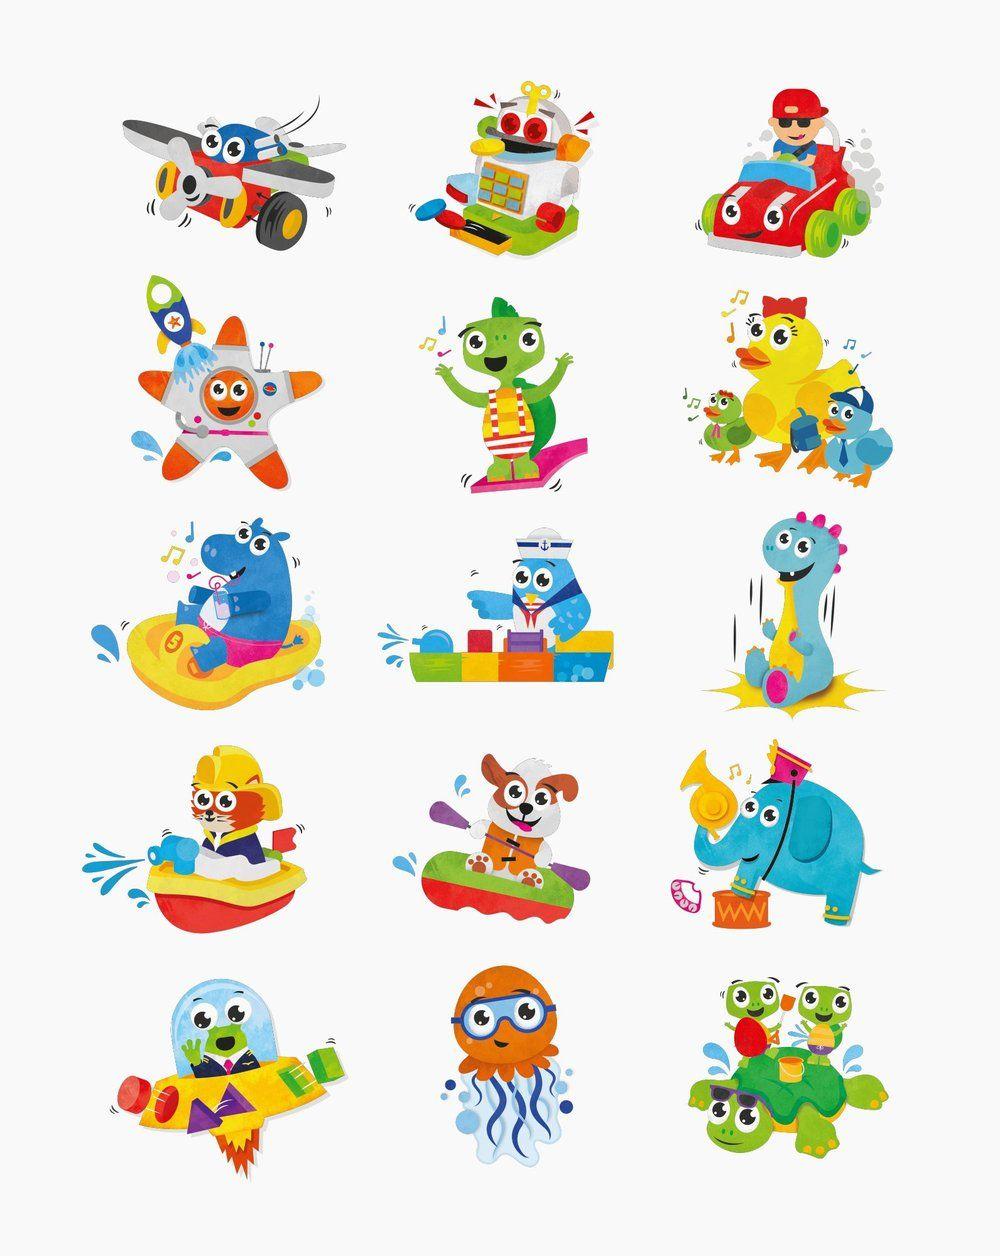 14Tomy_Characters2.jpg